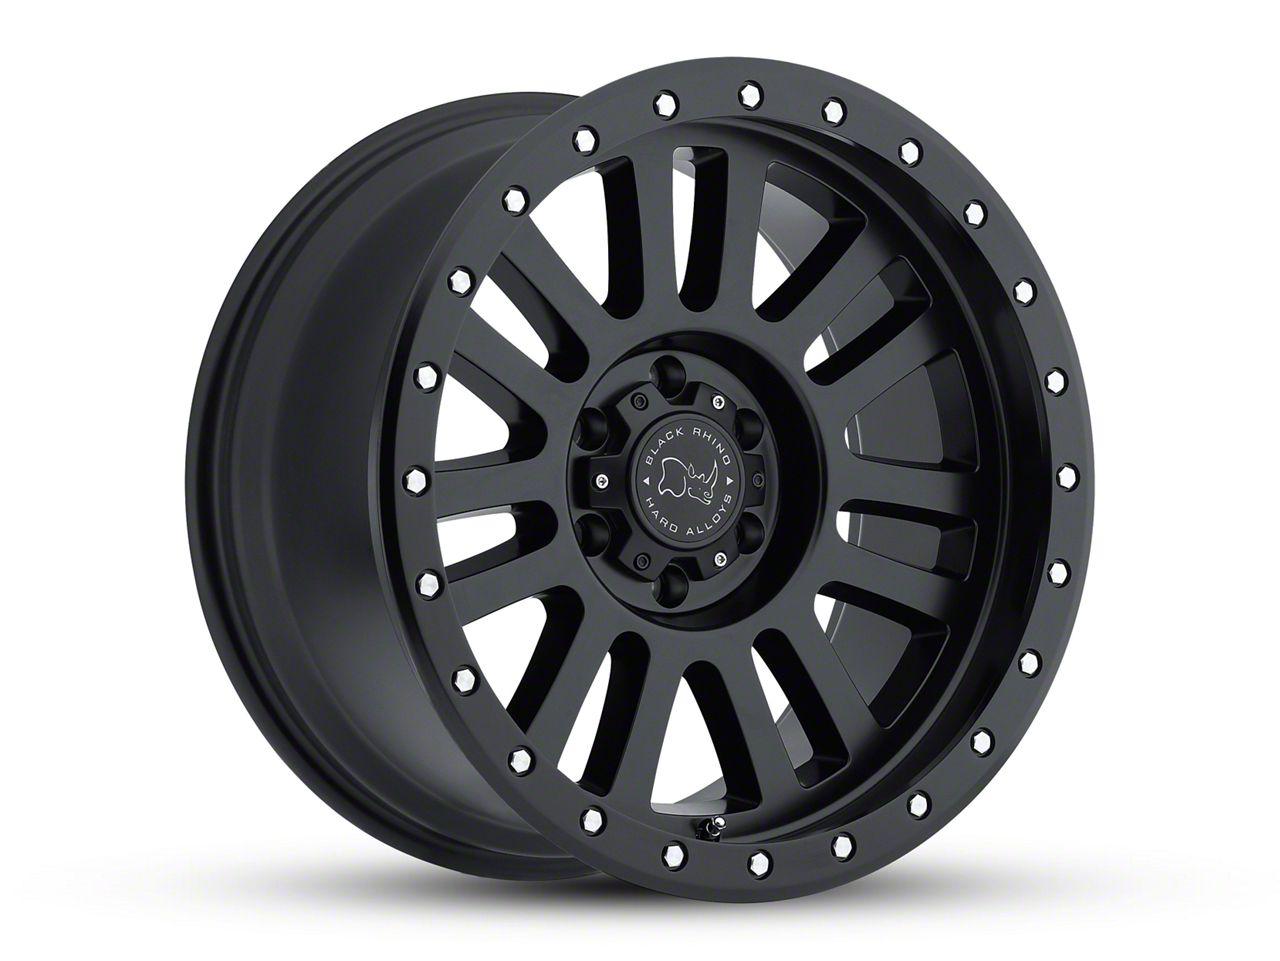 Black Rhino El Cajon Matte Black 6-Lug Wheel - 18x9 (07-18 Sierra 1500)